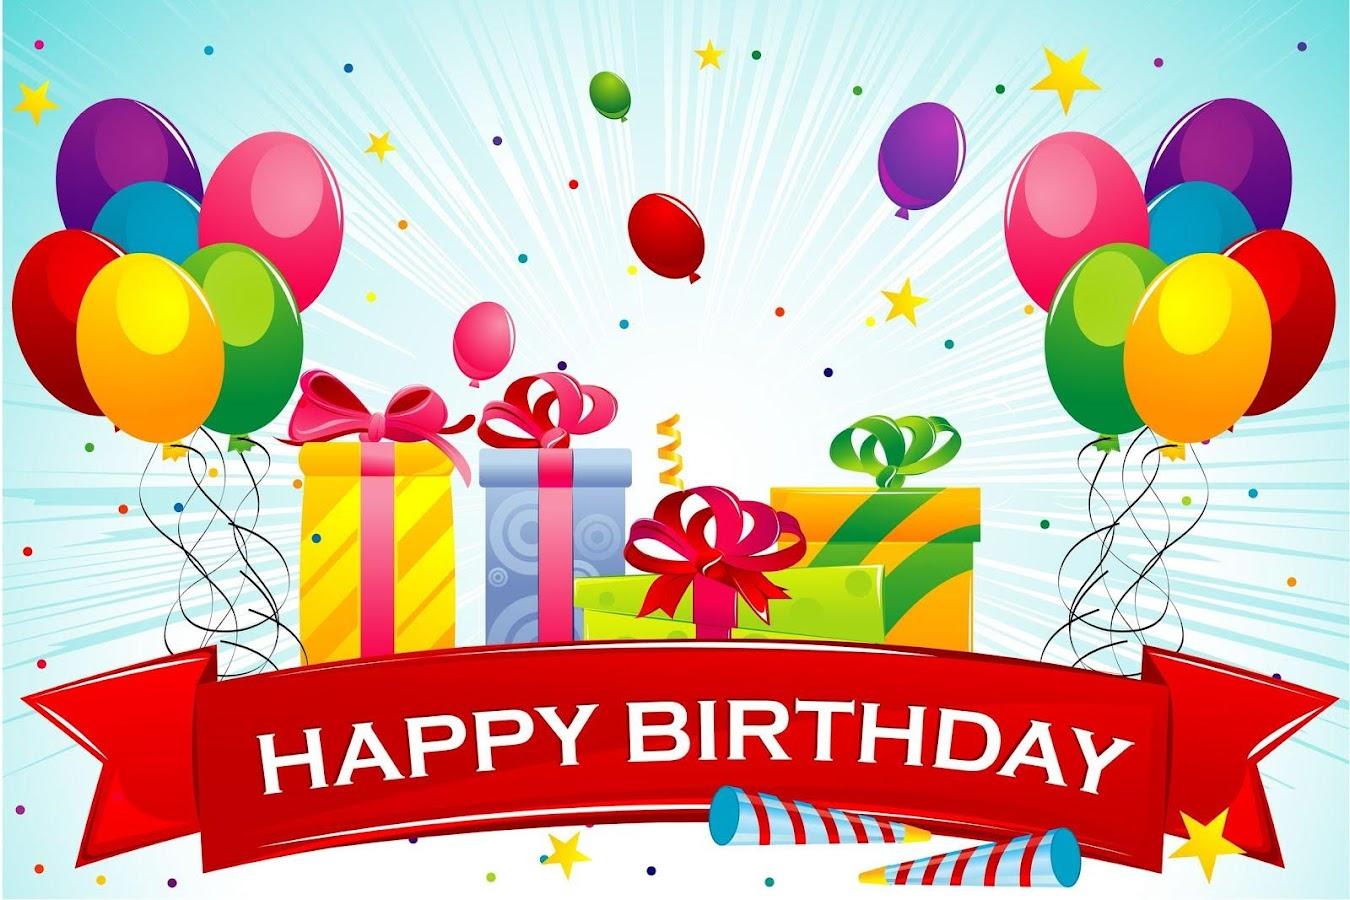 Happy Birthday Wallpapers- screenshot